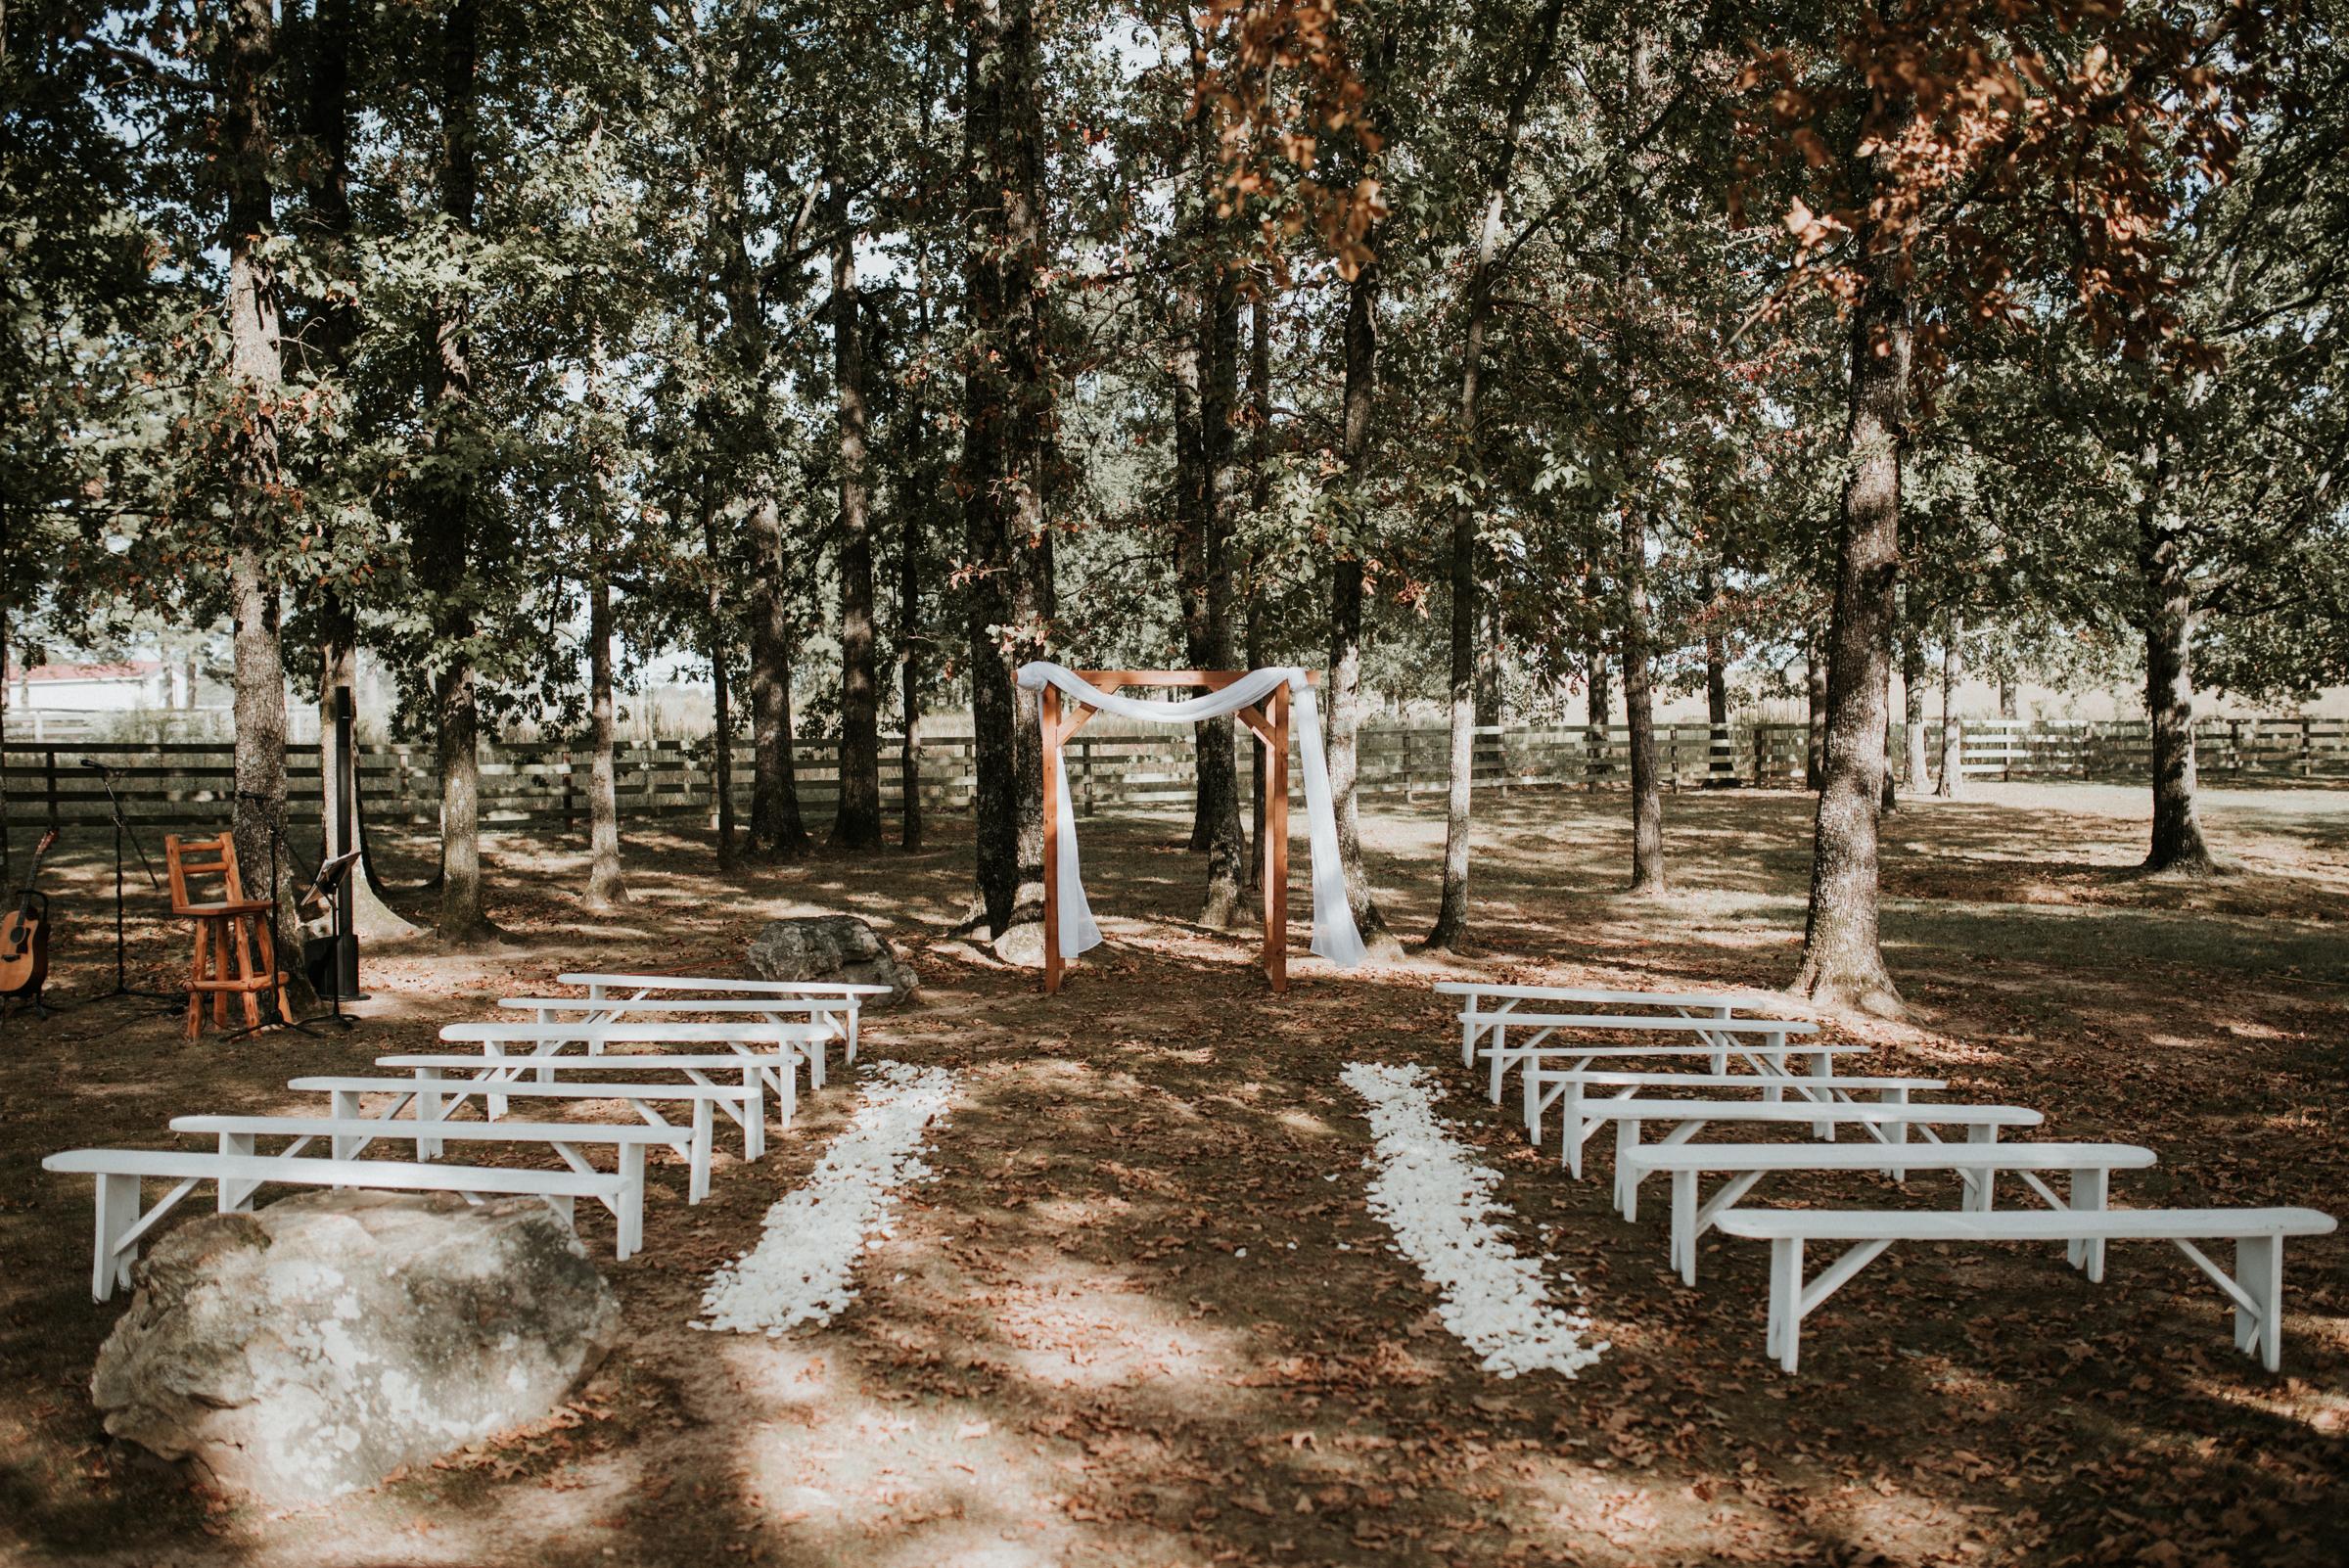 Zach&Rosalie Marion St. Louis Wedding Photographer-9890.jpg